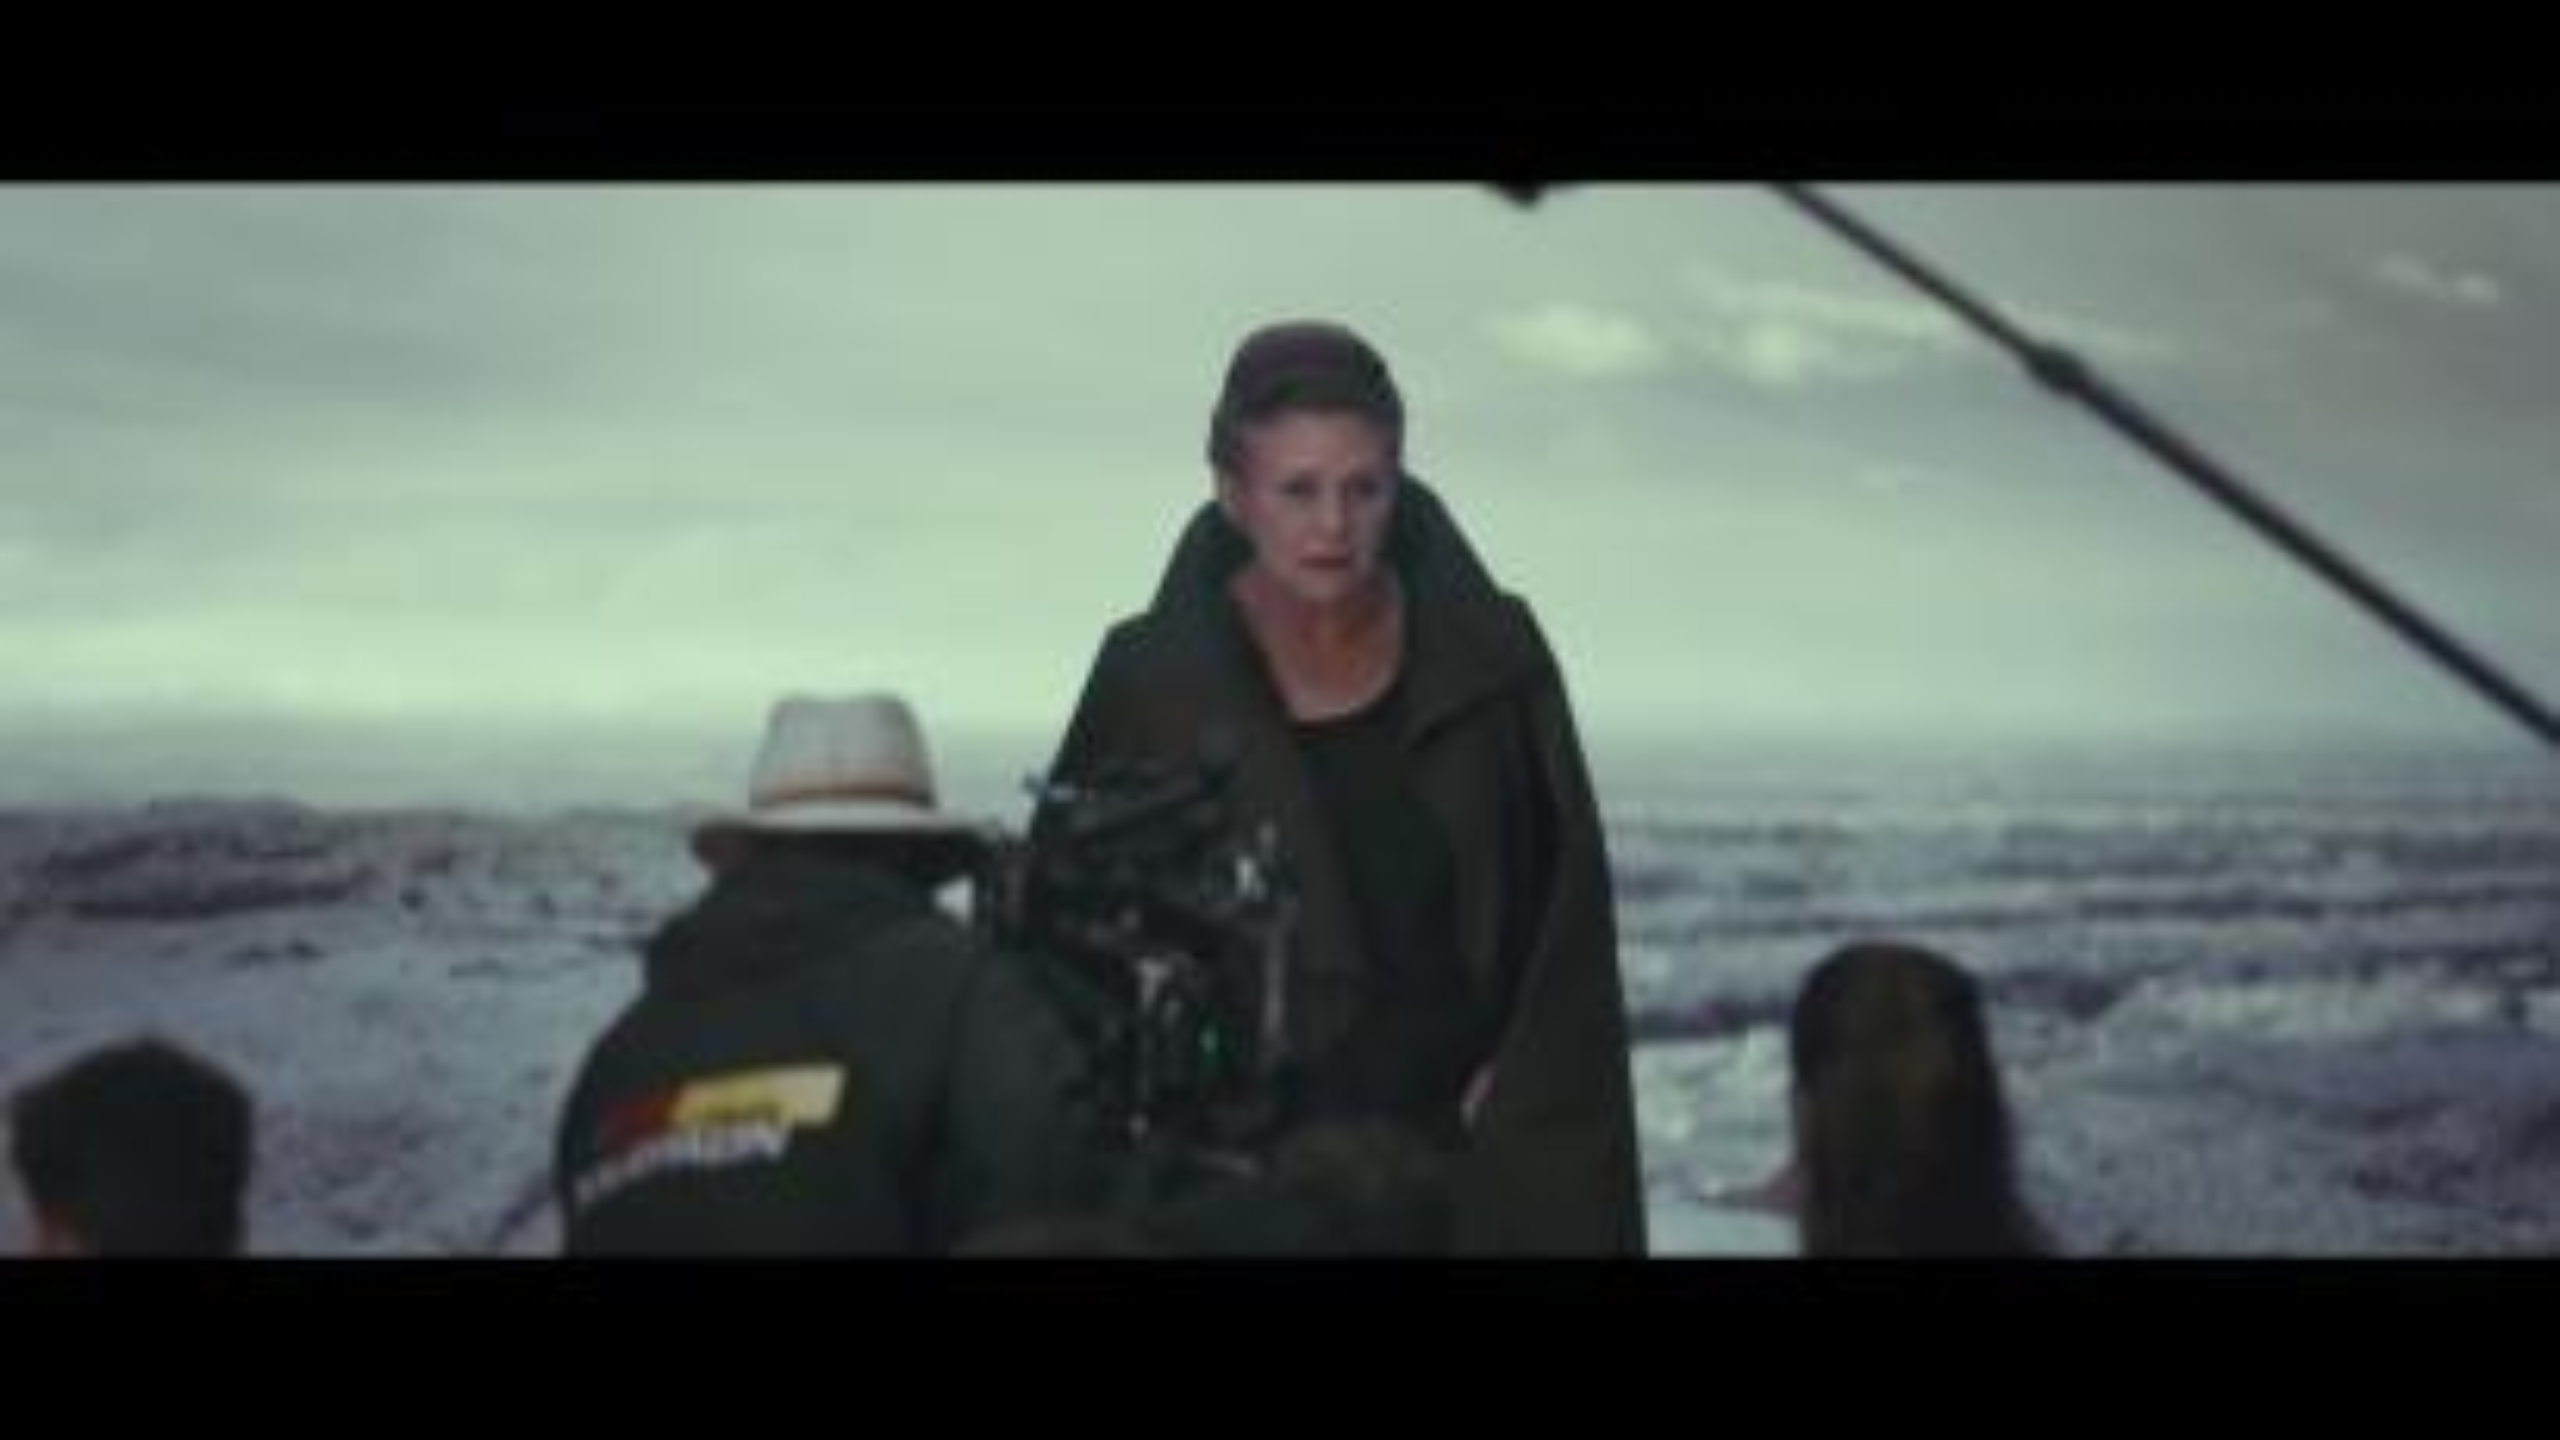 Disney D23 showed new information on The Last Jedi, a Star Wars